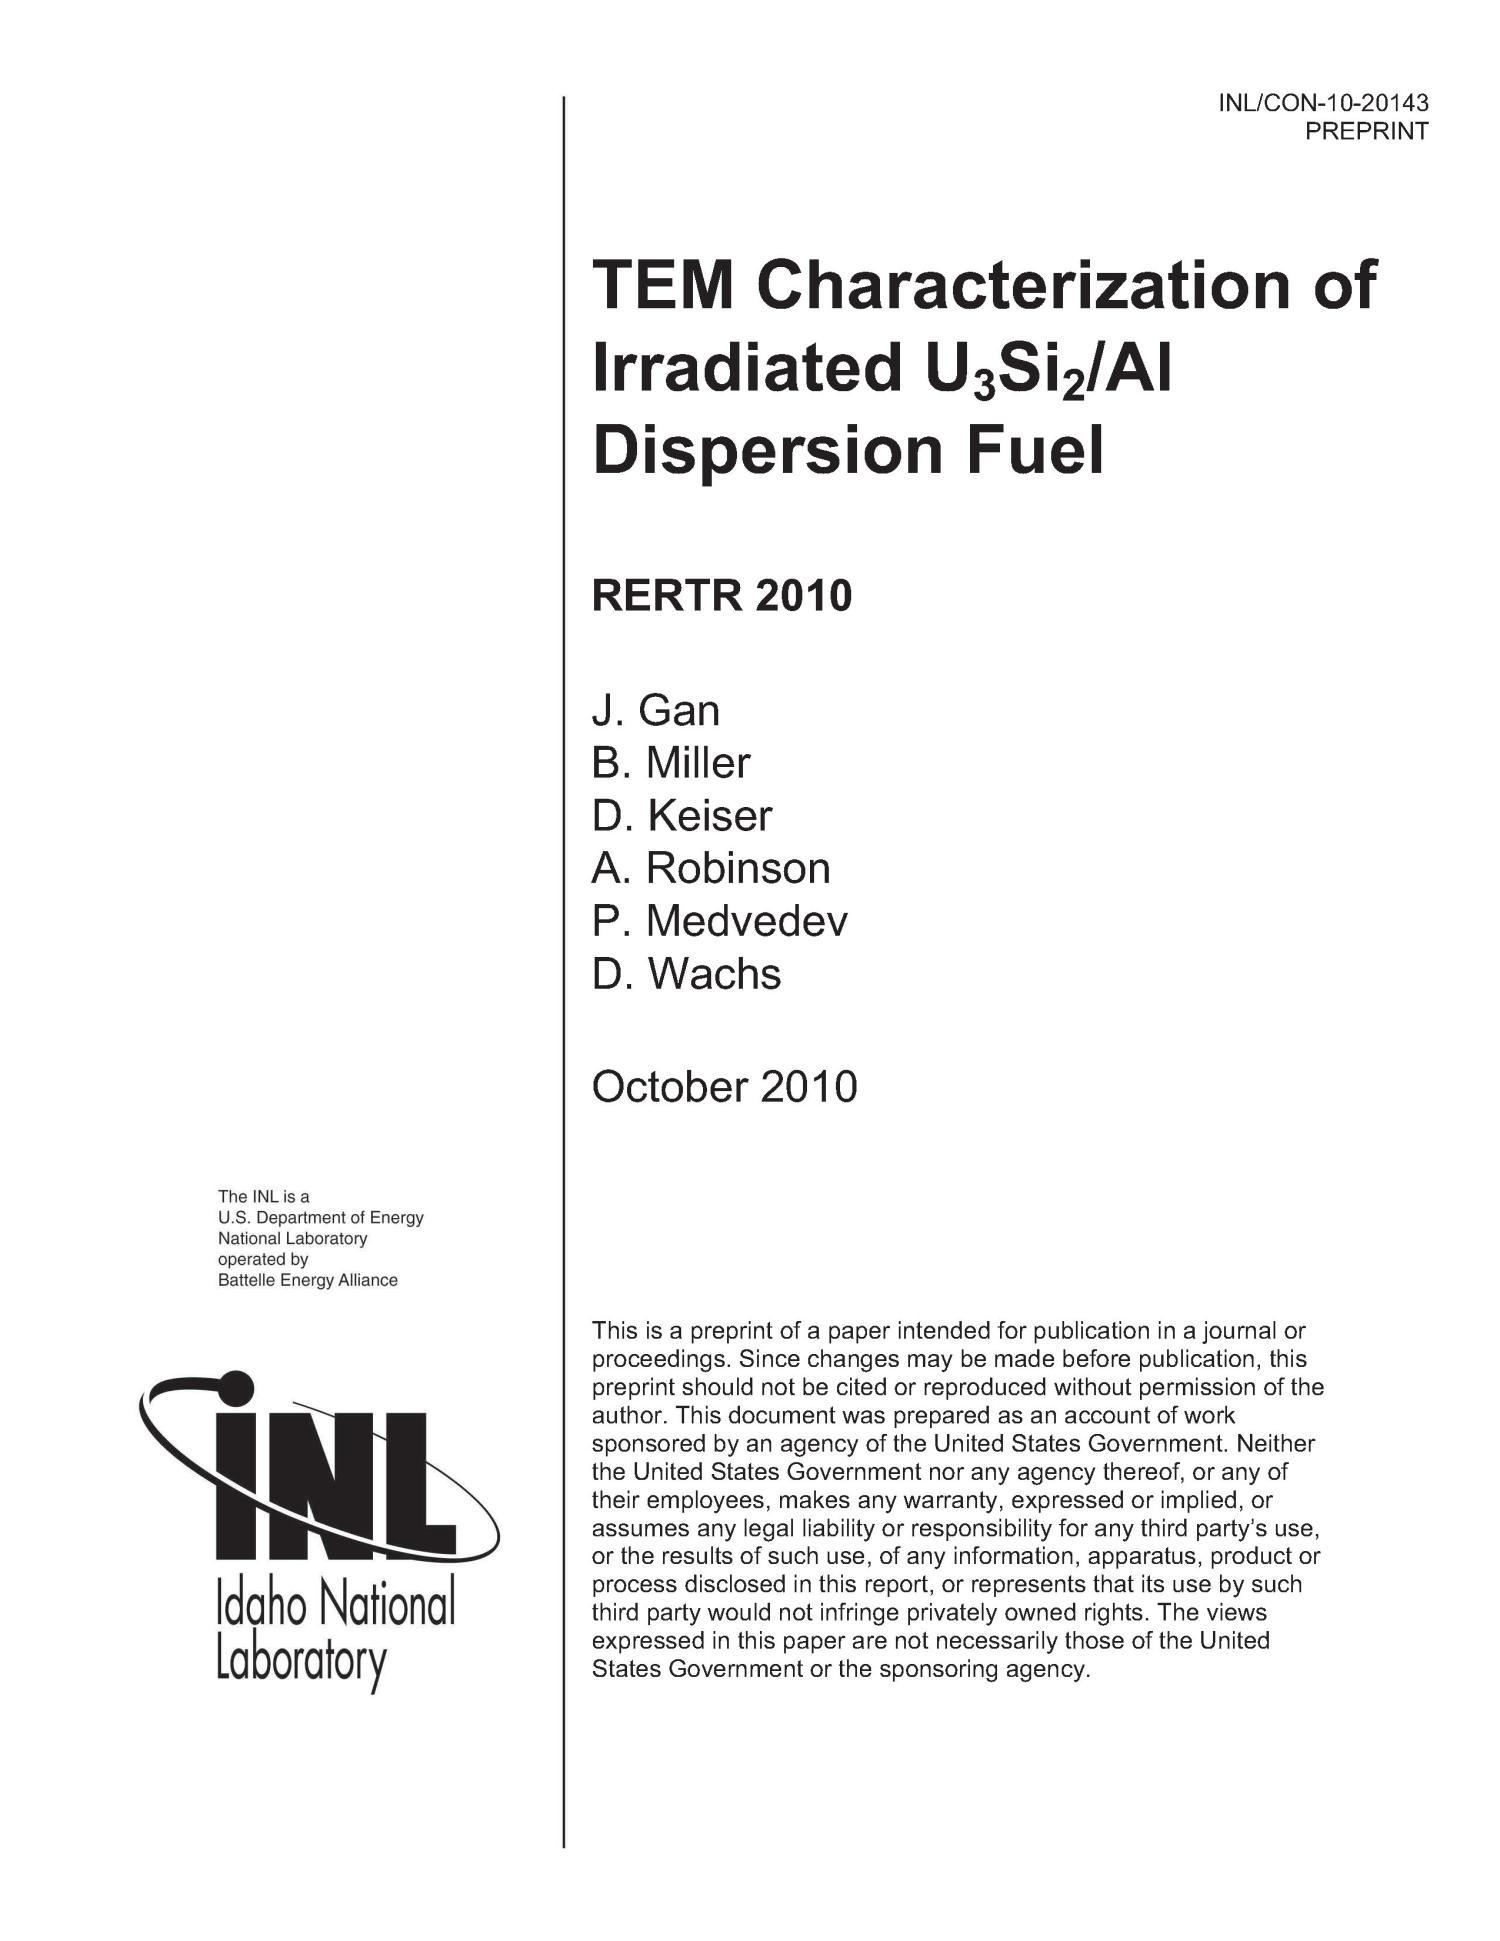 TEM CHARACTERIZATION OF IRRADIATED U3SI2/AL DISPERSION FUEL - Digital Library